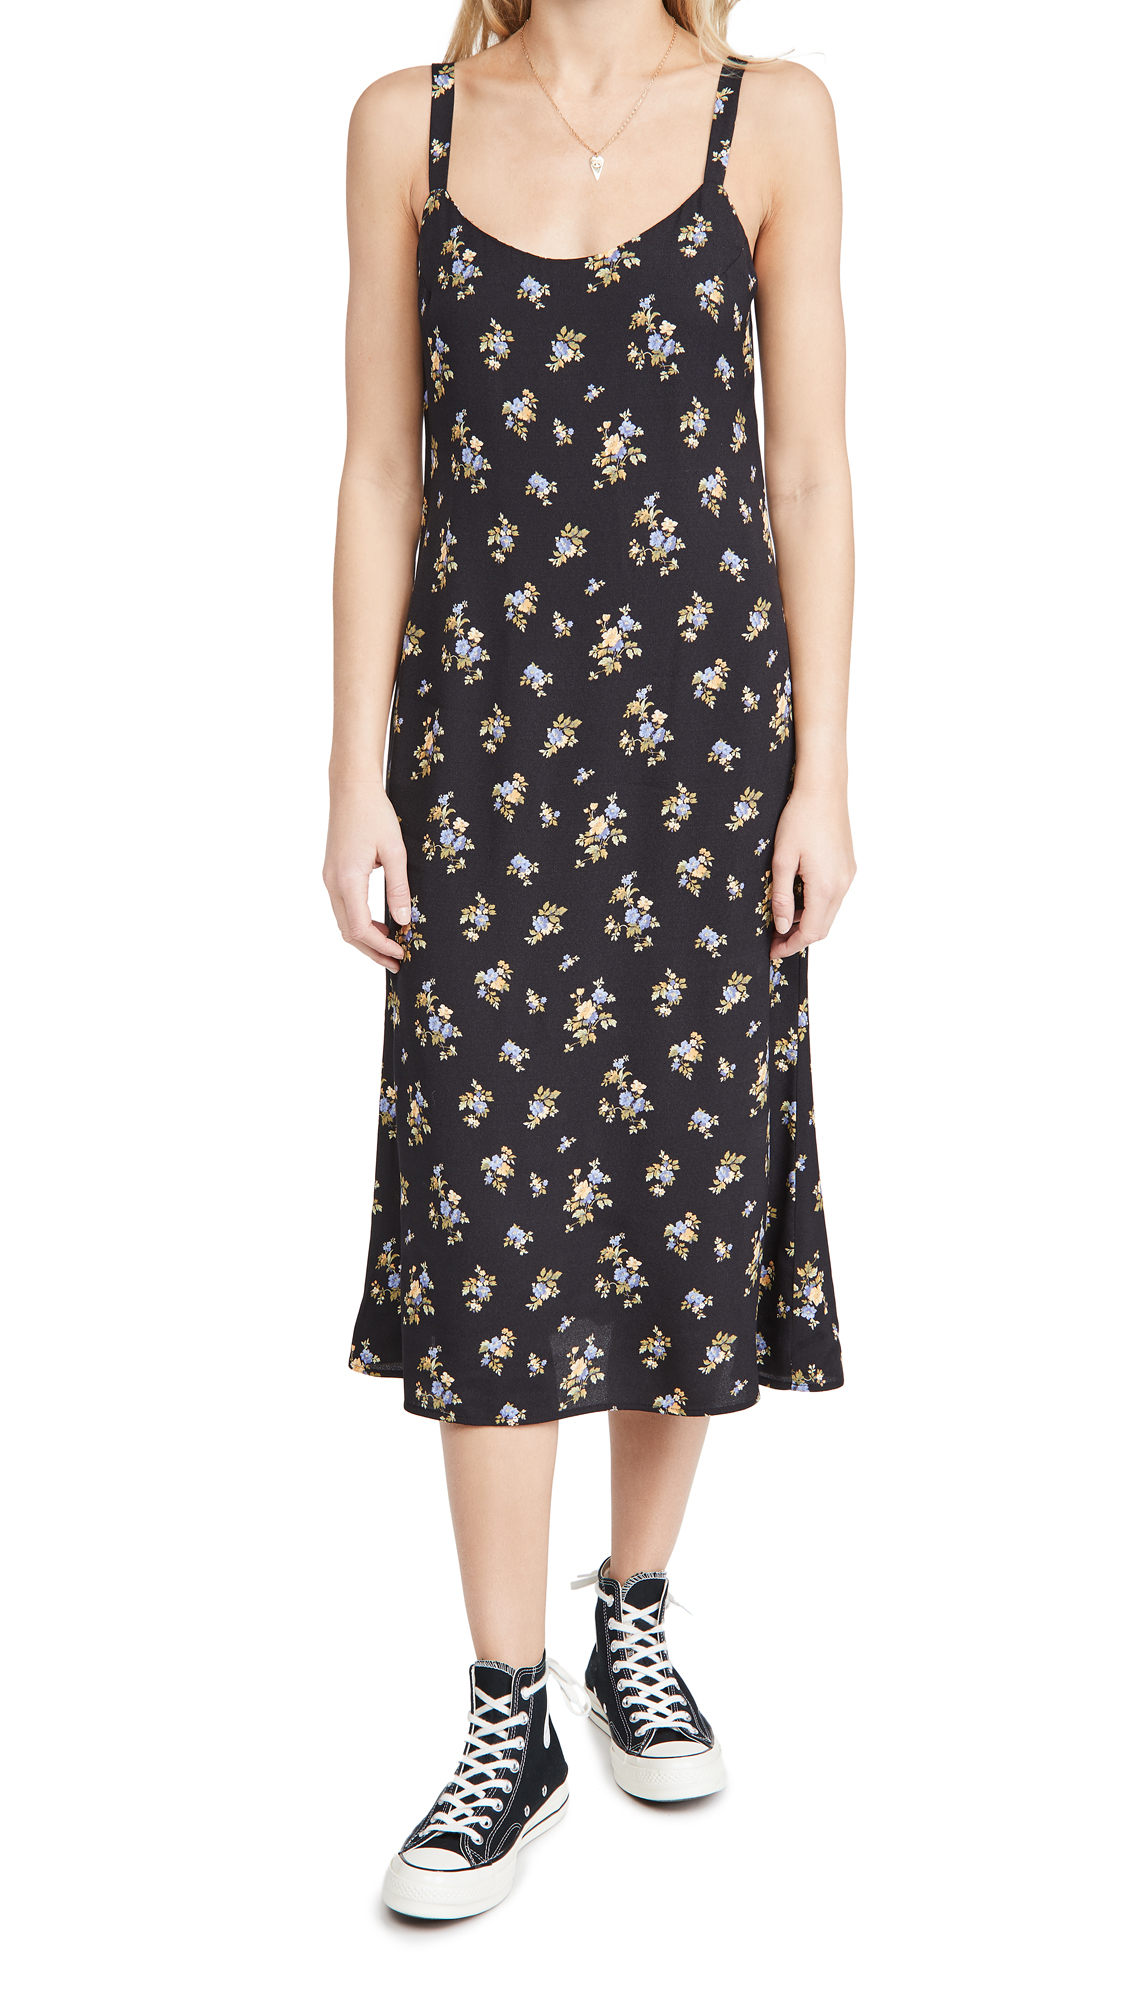 Reformation Avalon Dress